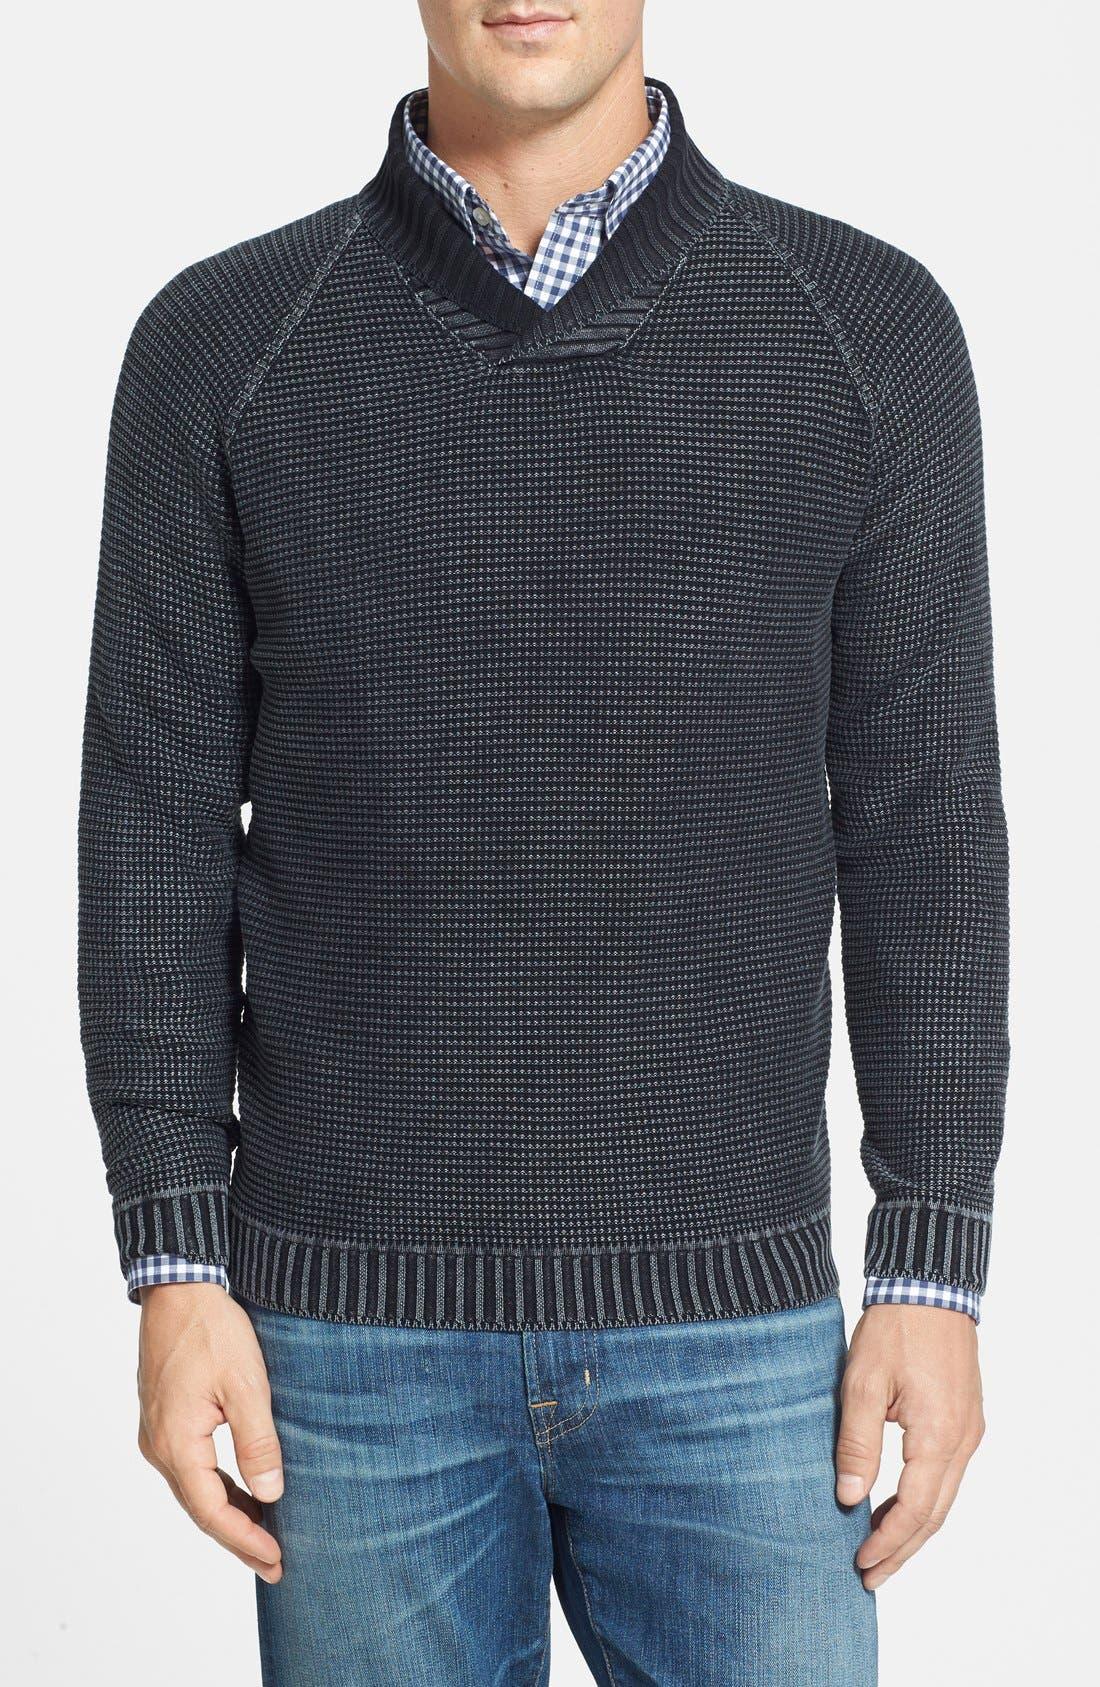 Alternate Image 1 Selected - Tommy Bahama '1 Island' Shawl Collar Sweater